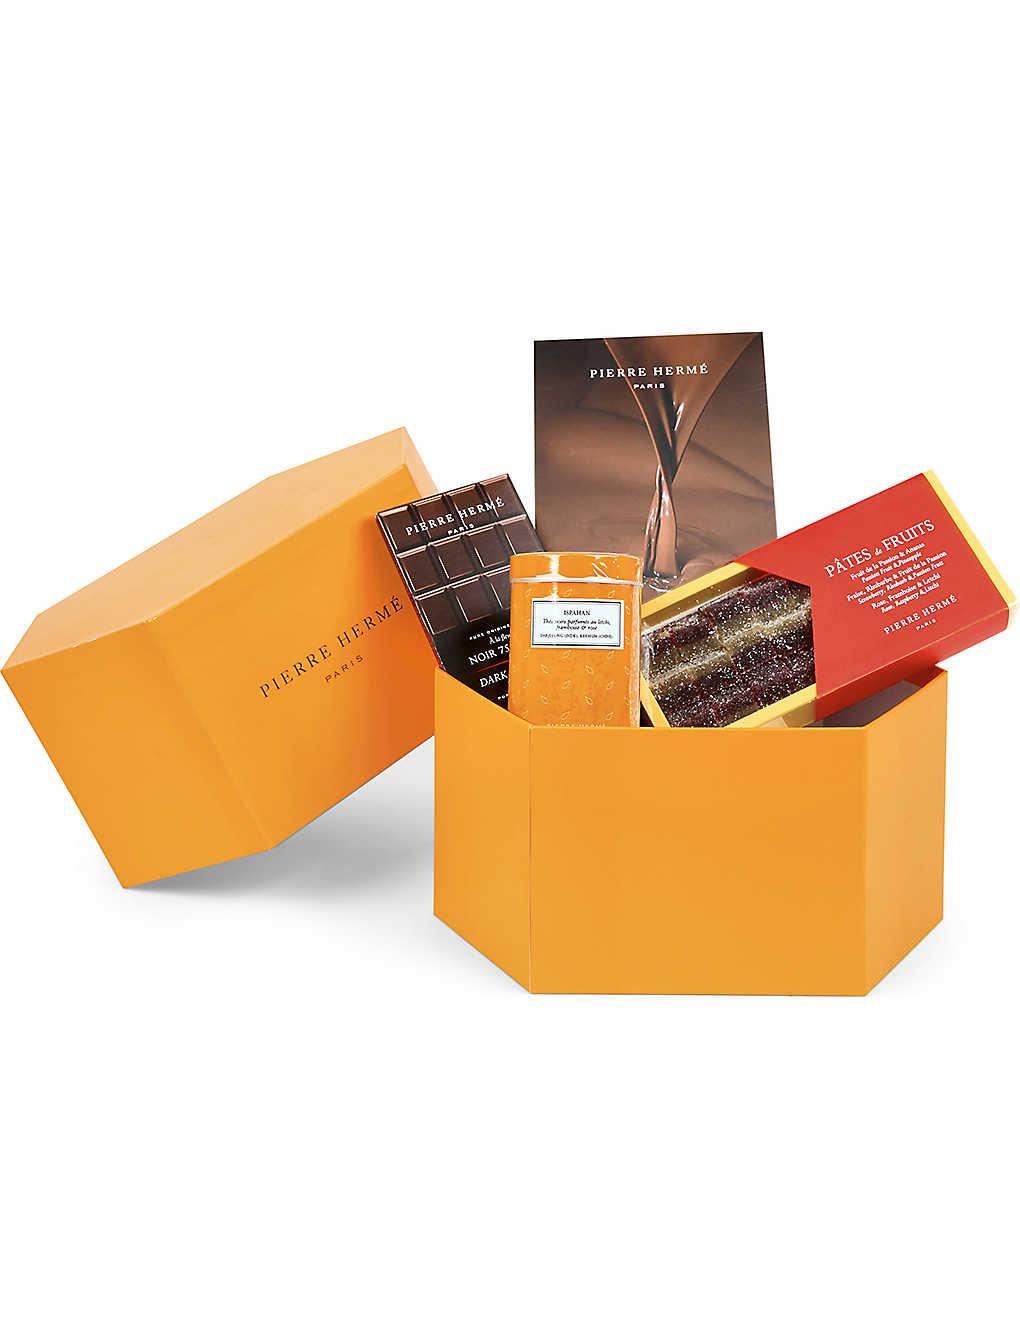 Pierre Herme Mosaic Gift Box Small Selfridges Com